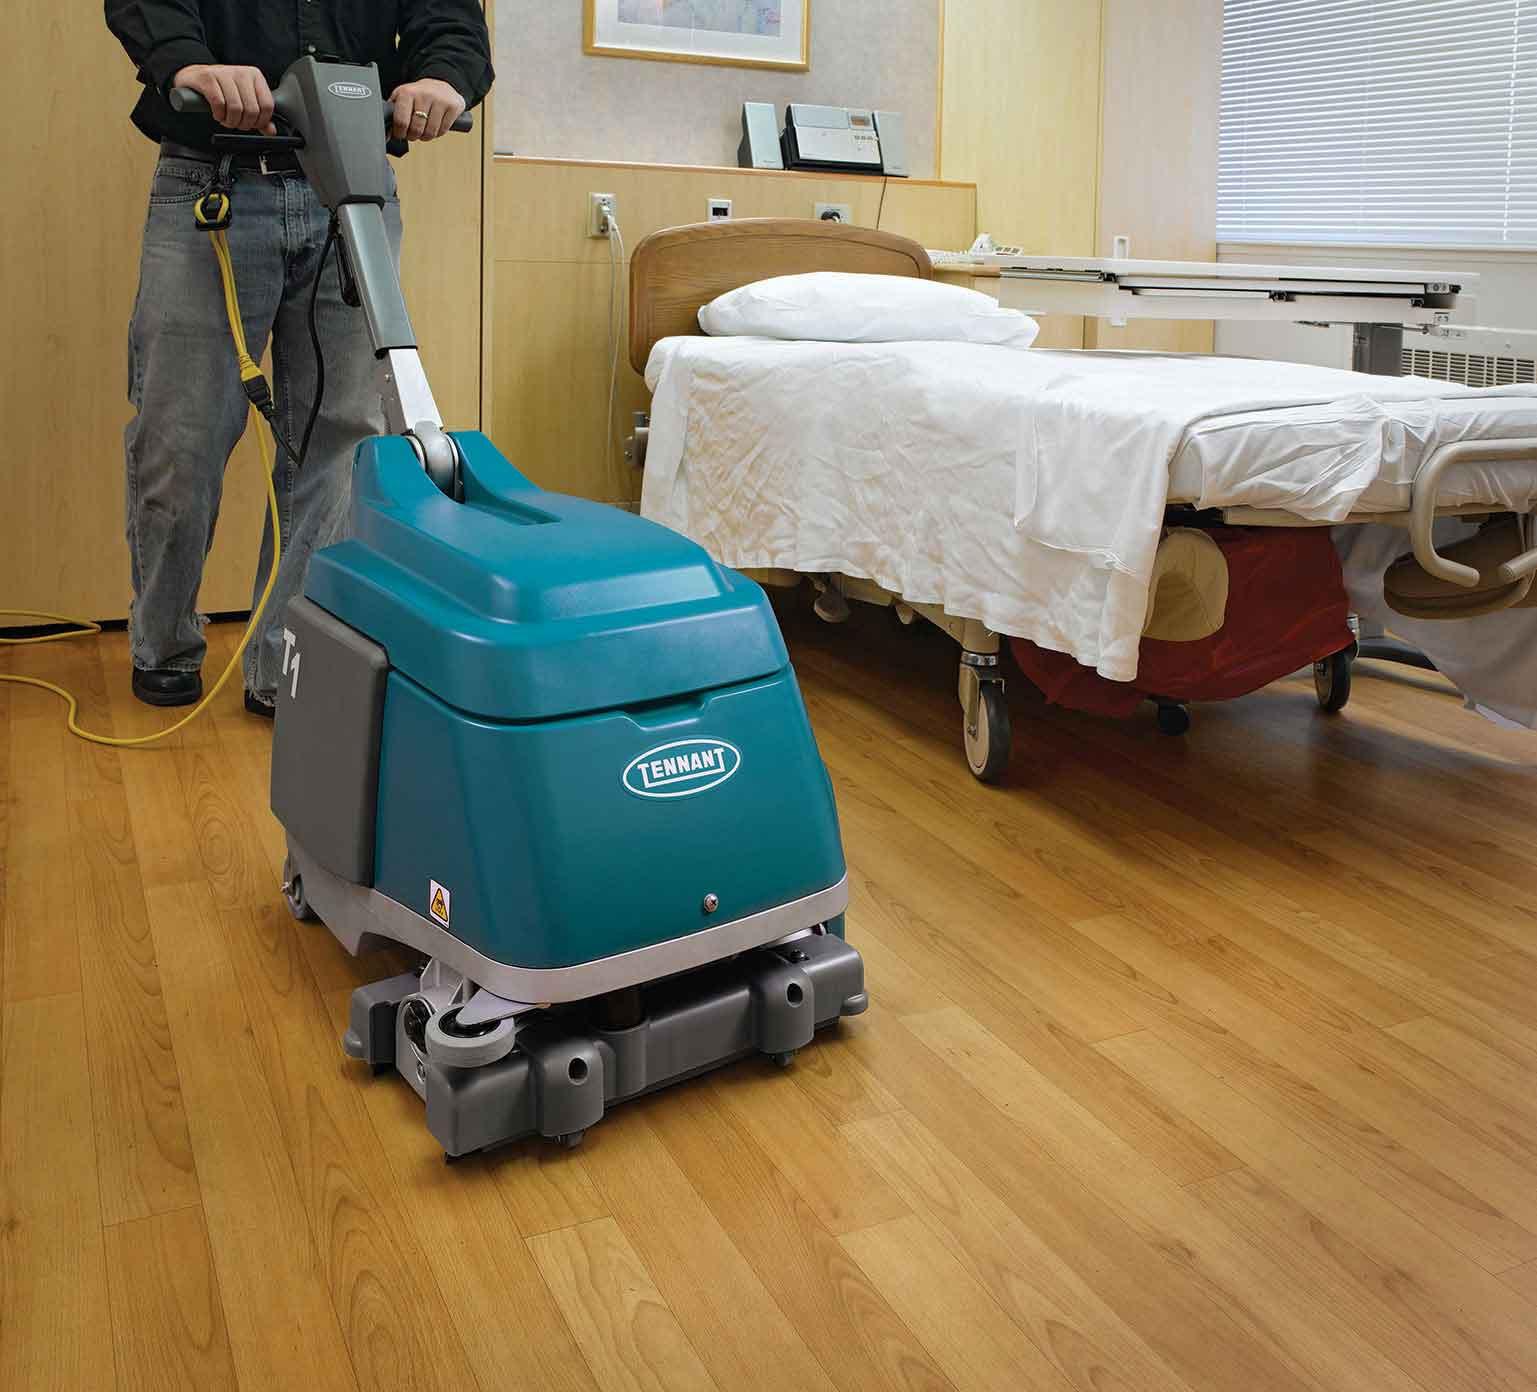 hardwood floor cleaner rental of t1 walk behind micro scrubber tennant company for t1 walk behind micro scrubber alt 4